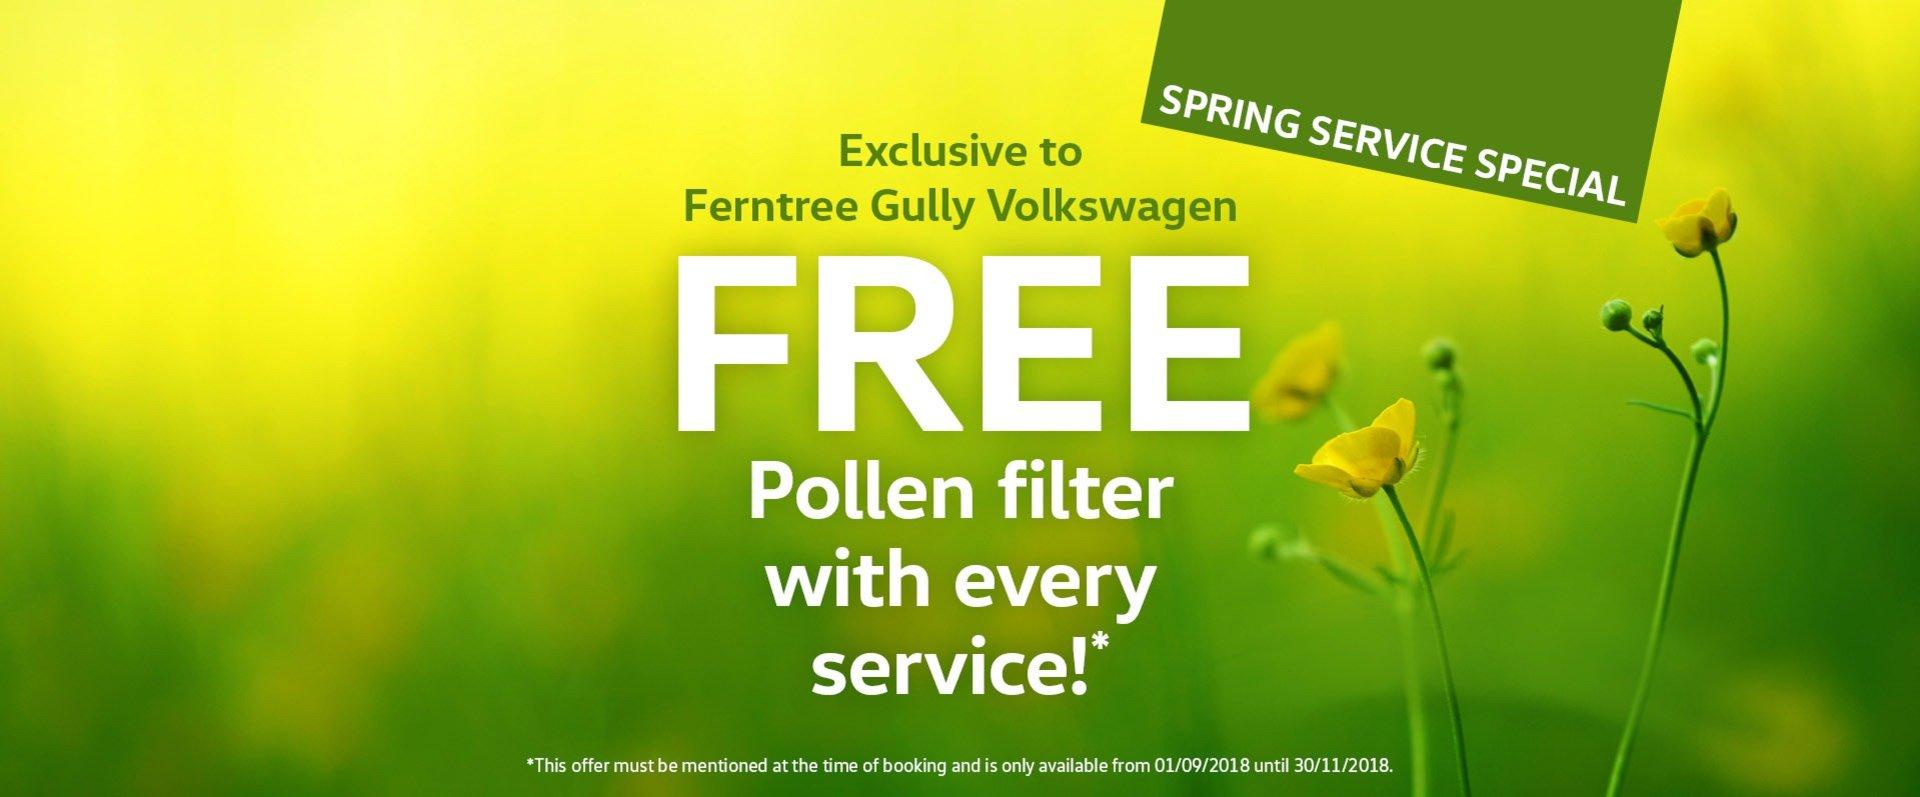 Free Pollen Filter